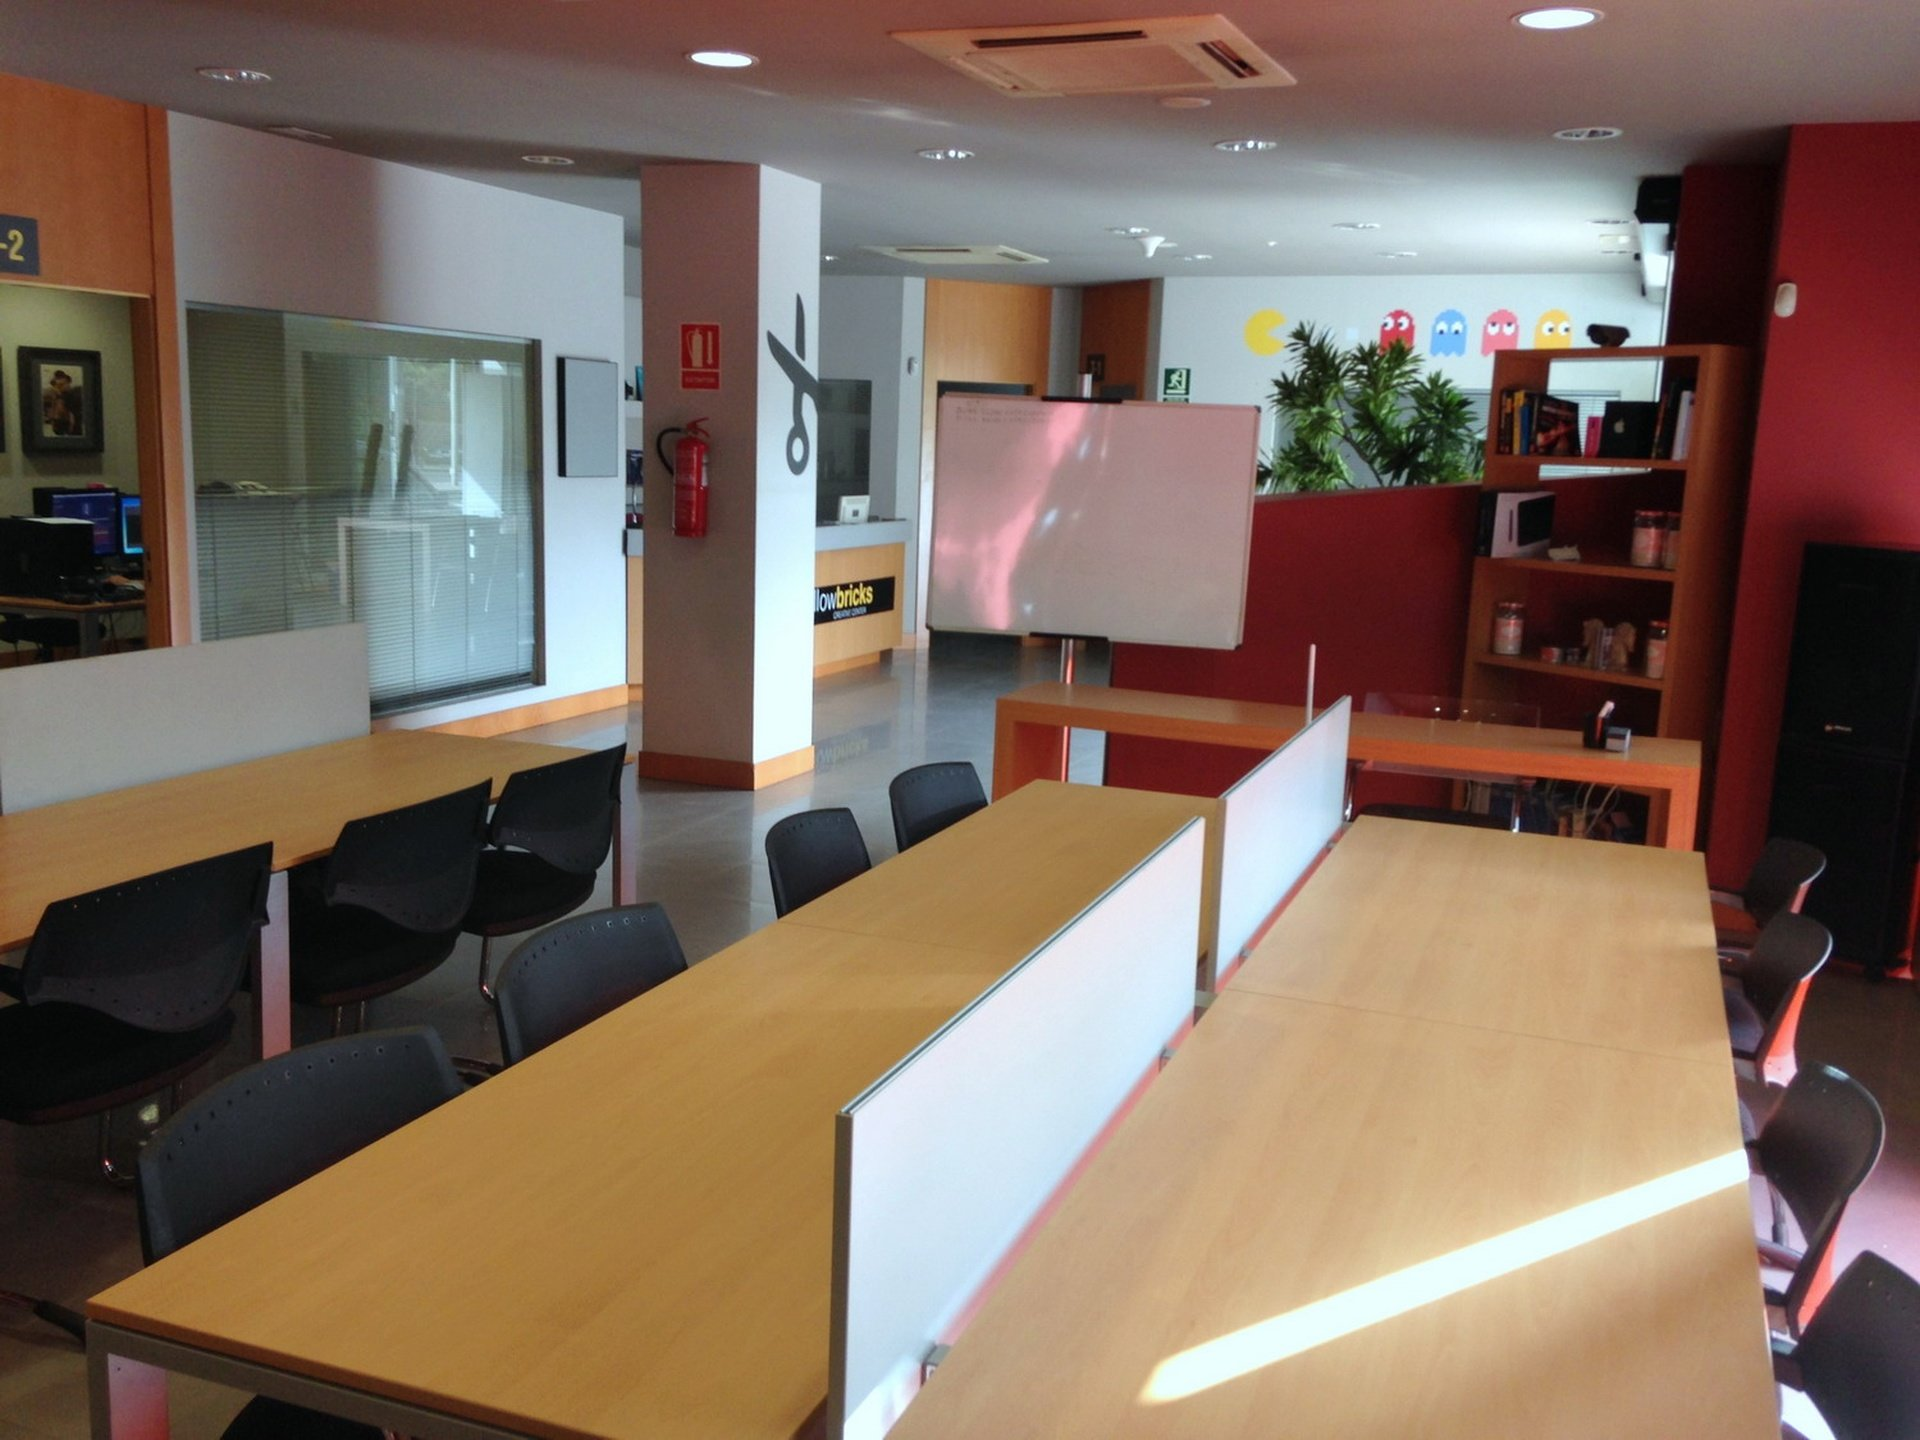 Malaga training rooms Salle de réunion Yellow Bricks Creative Centre - Communal Area image 0